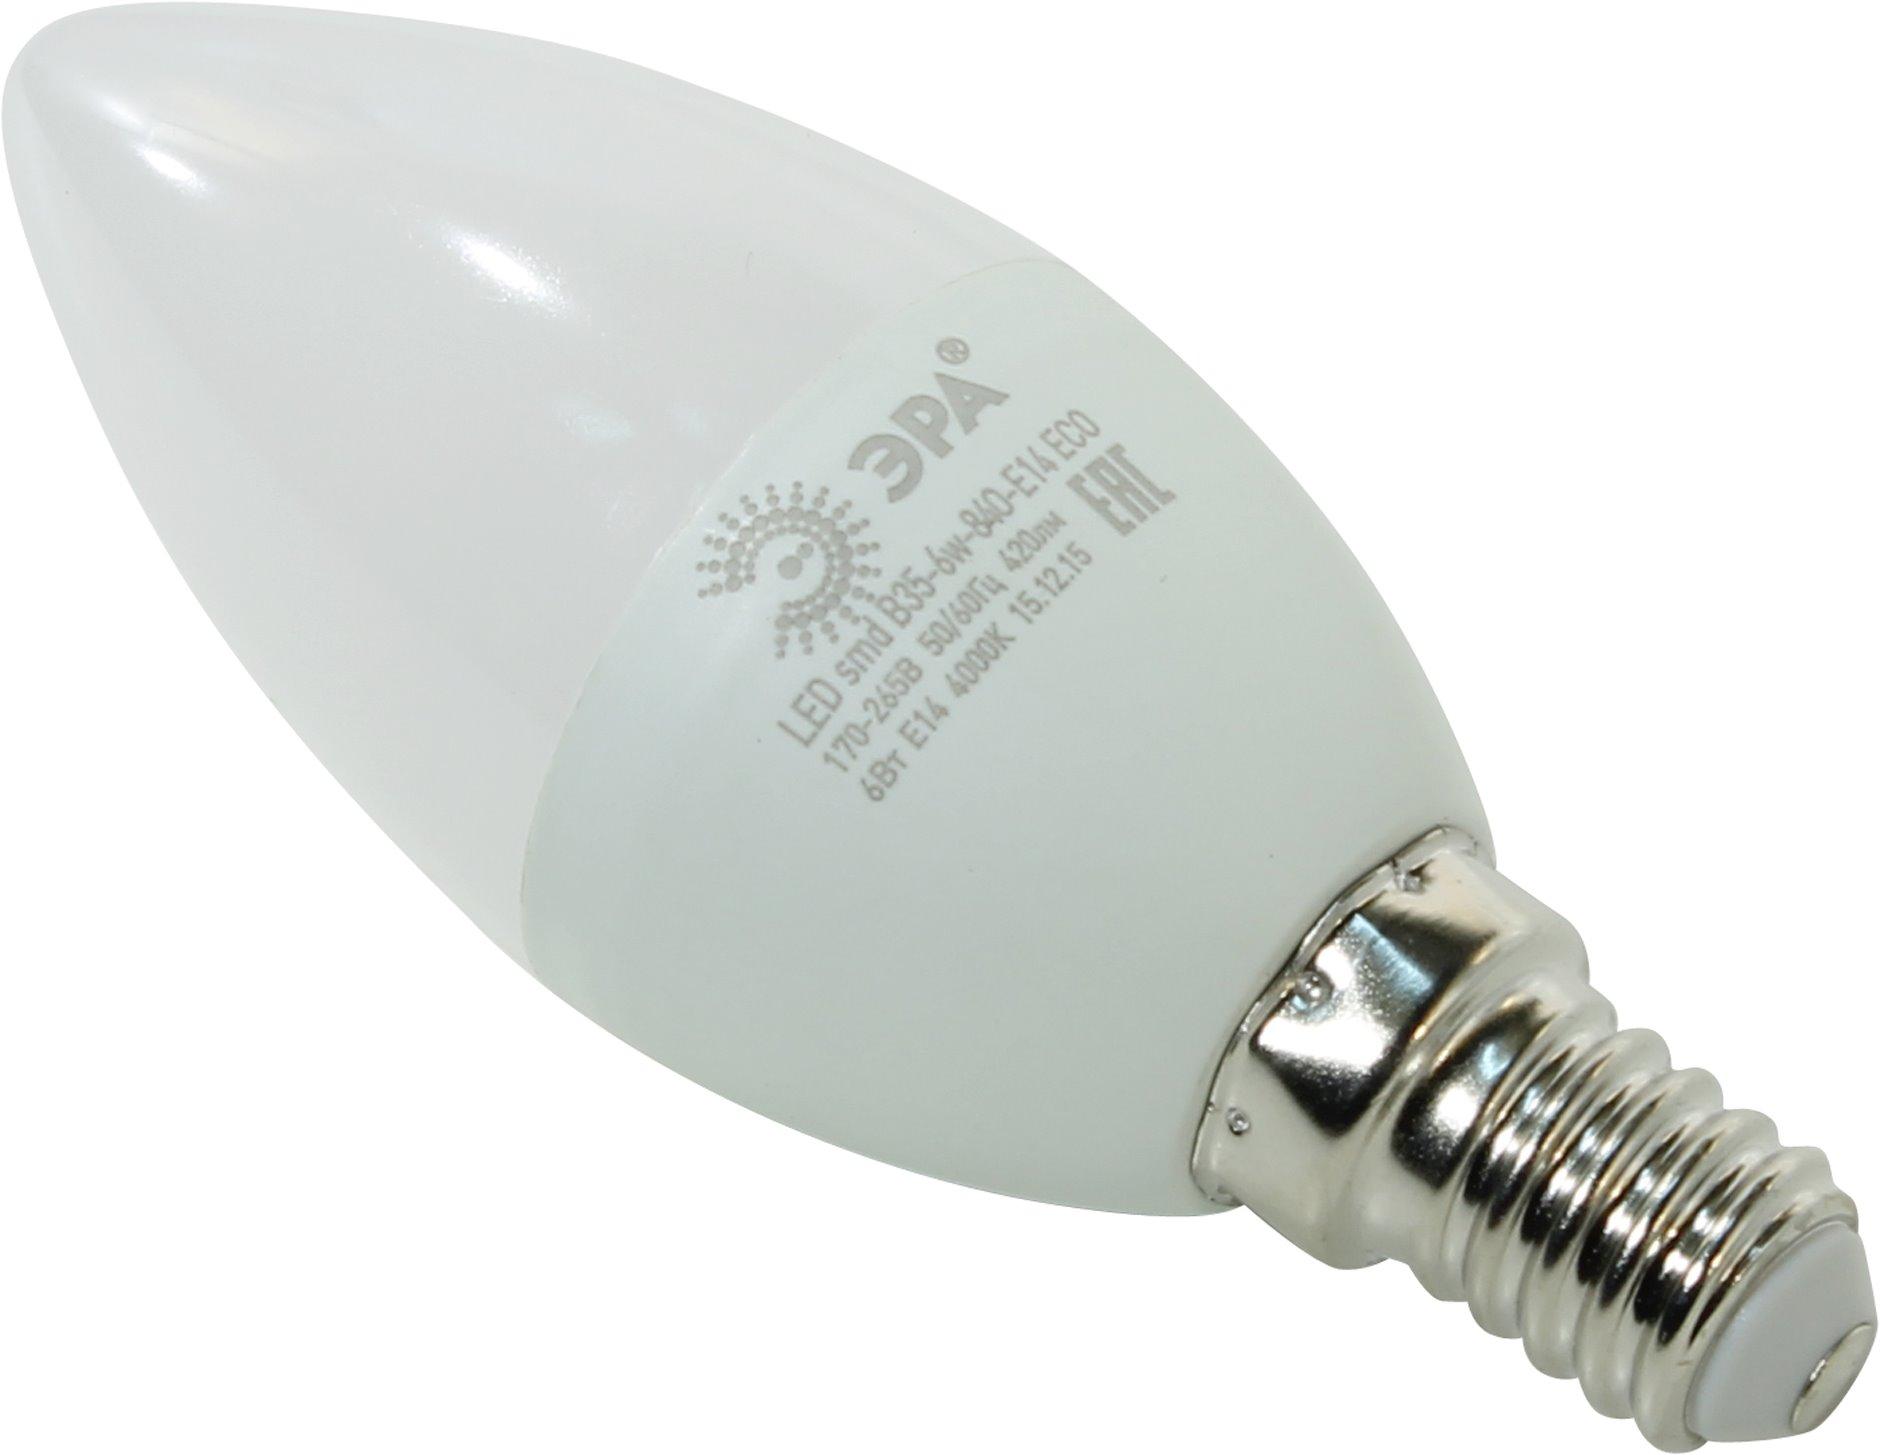 Лампа светодиодная ЭРА F-led лампы